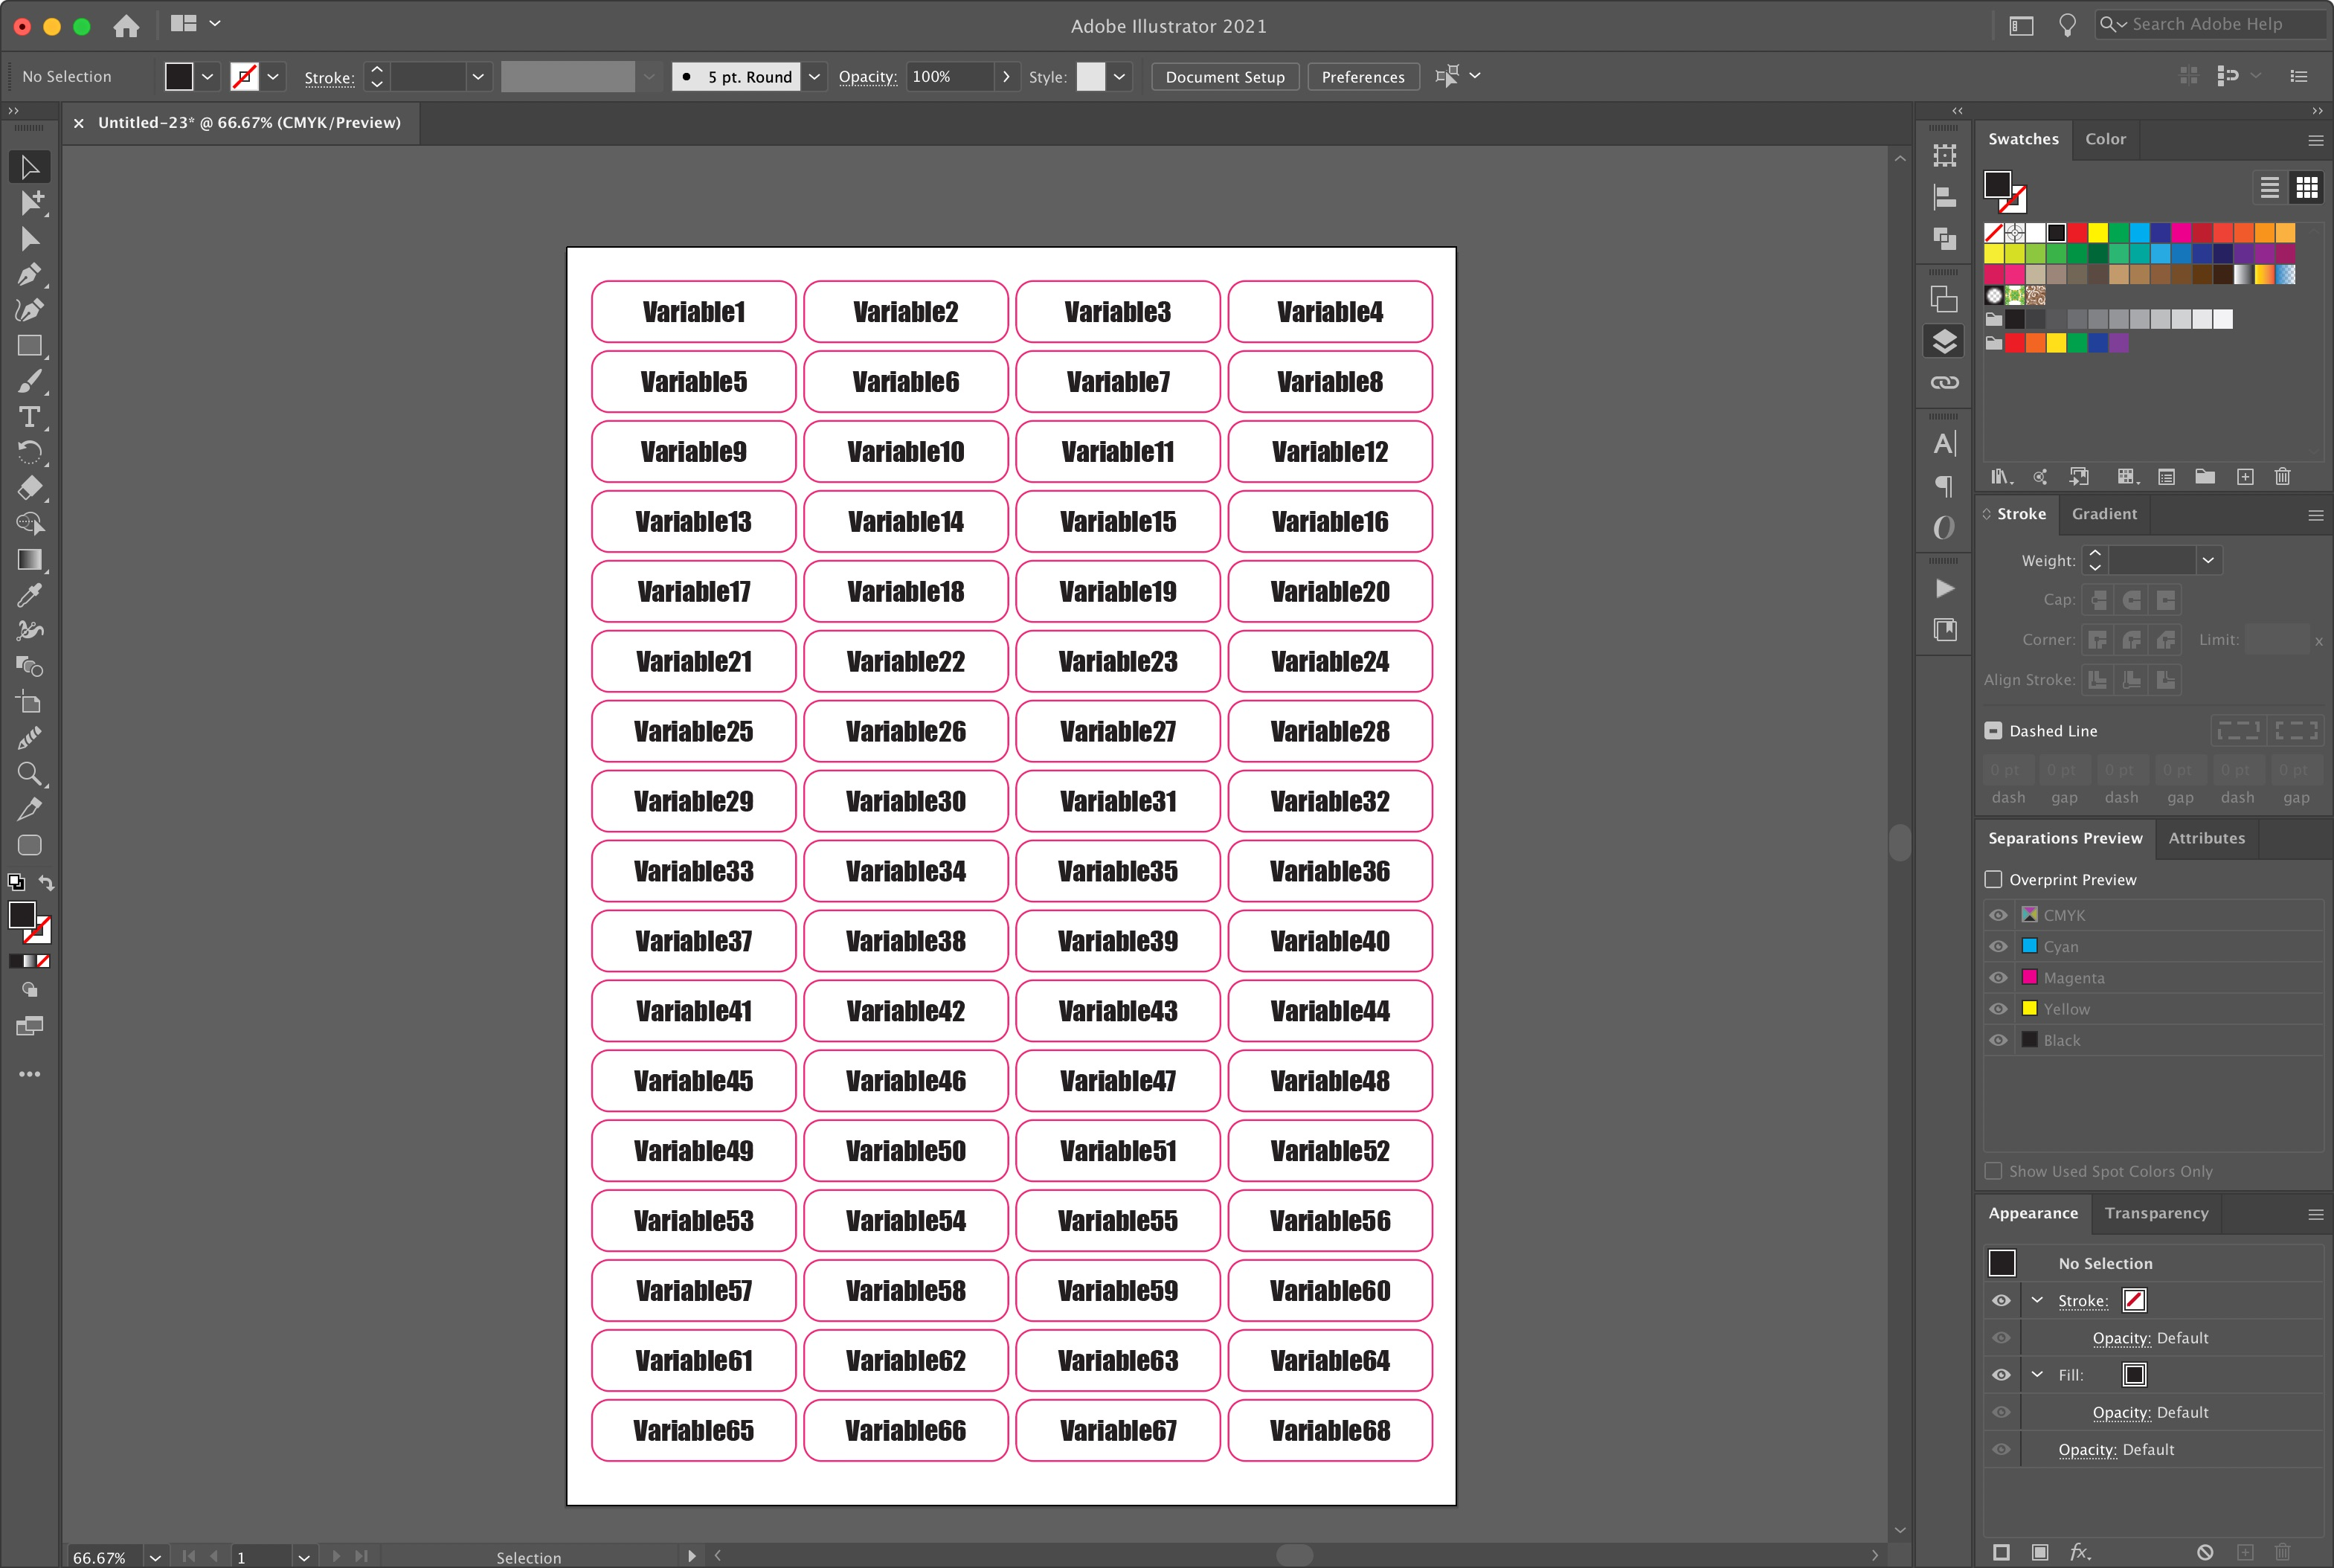 adobe illustrator variable data